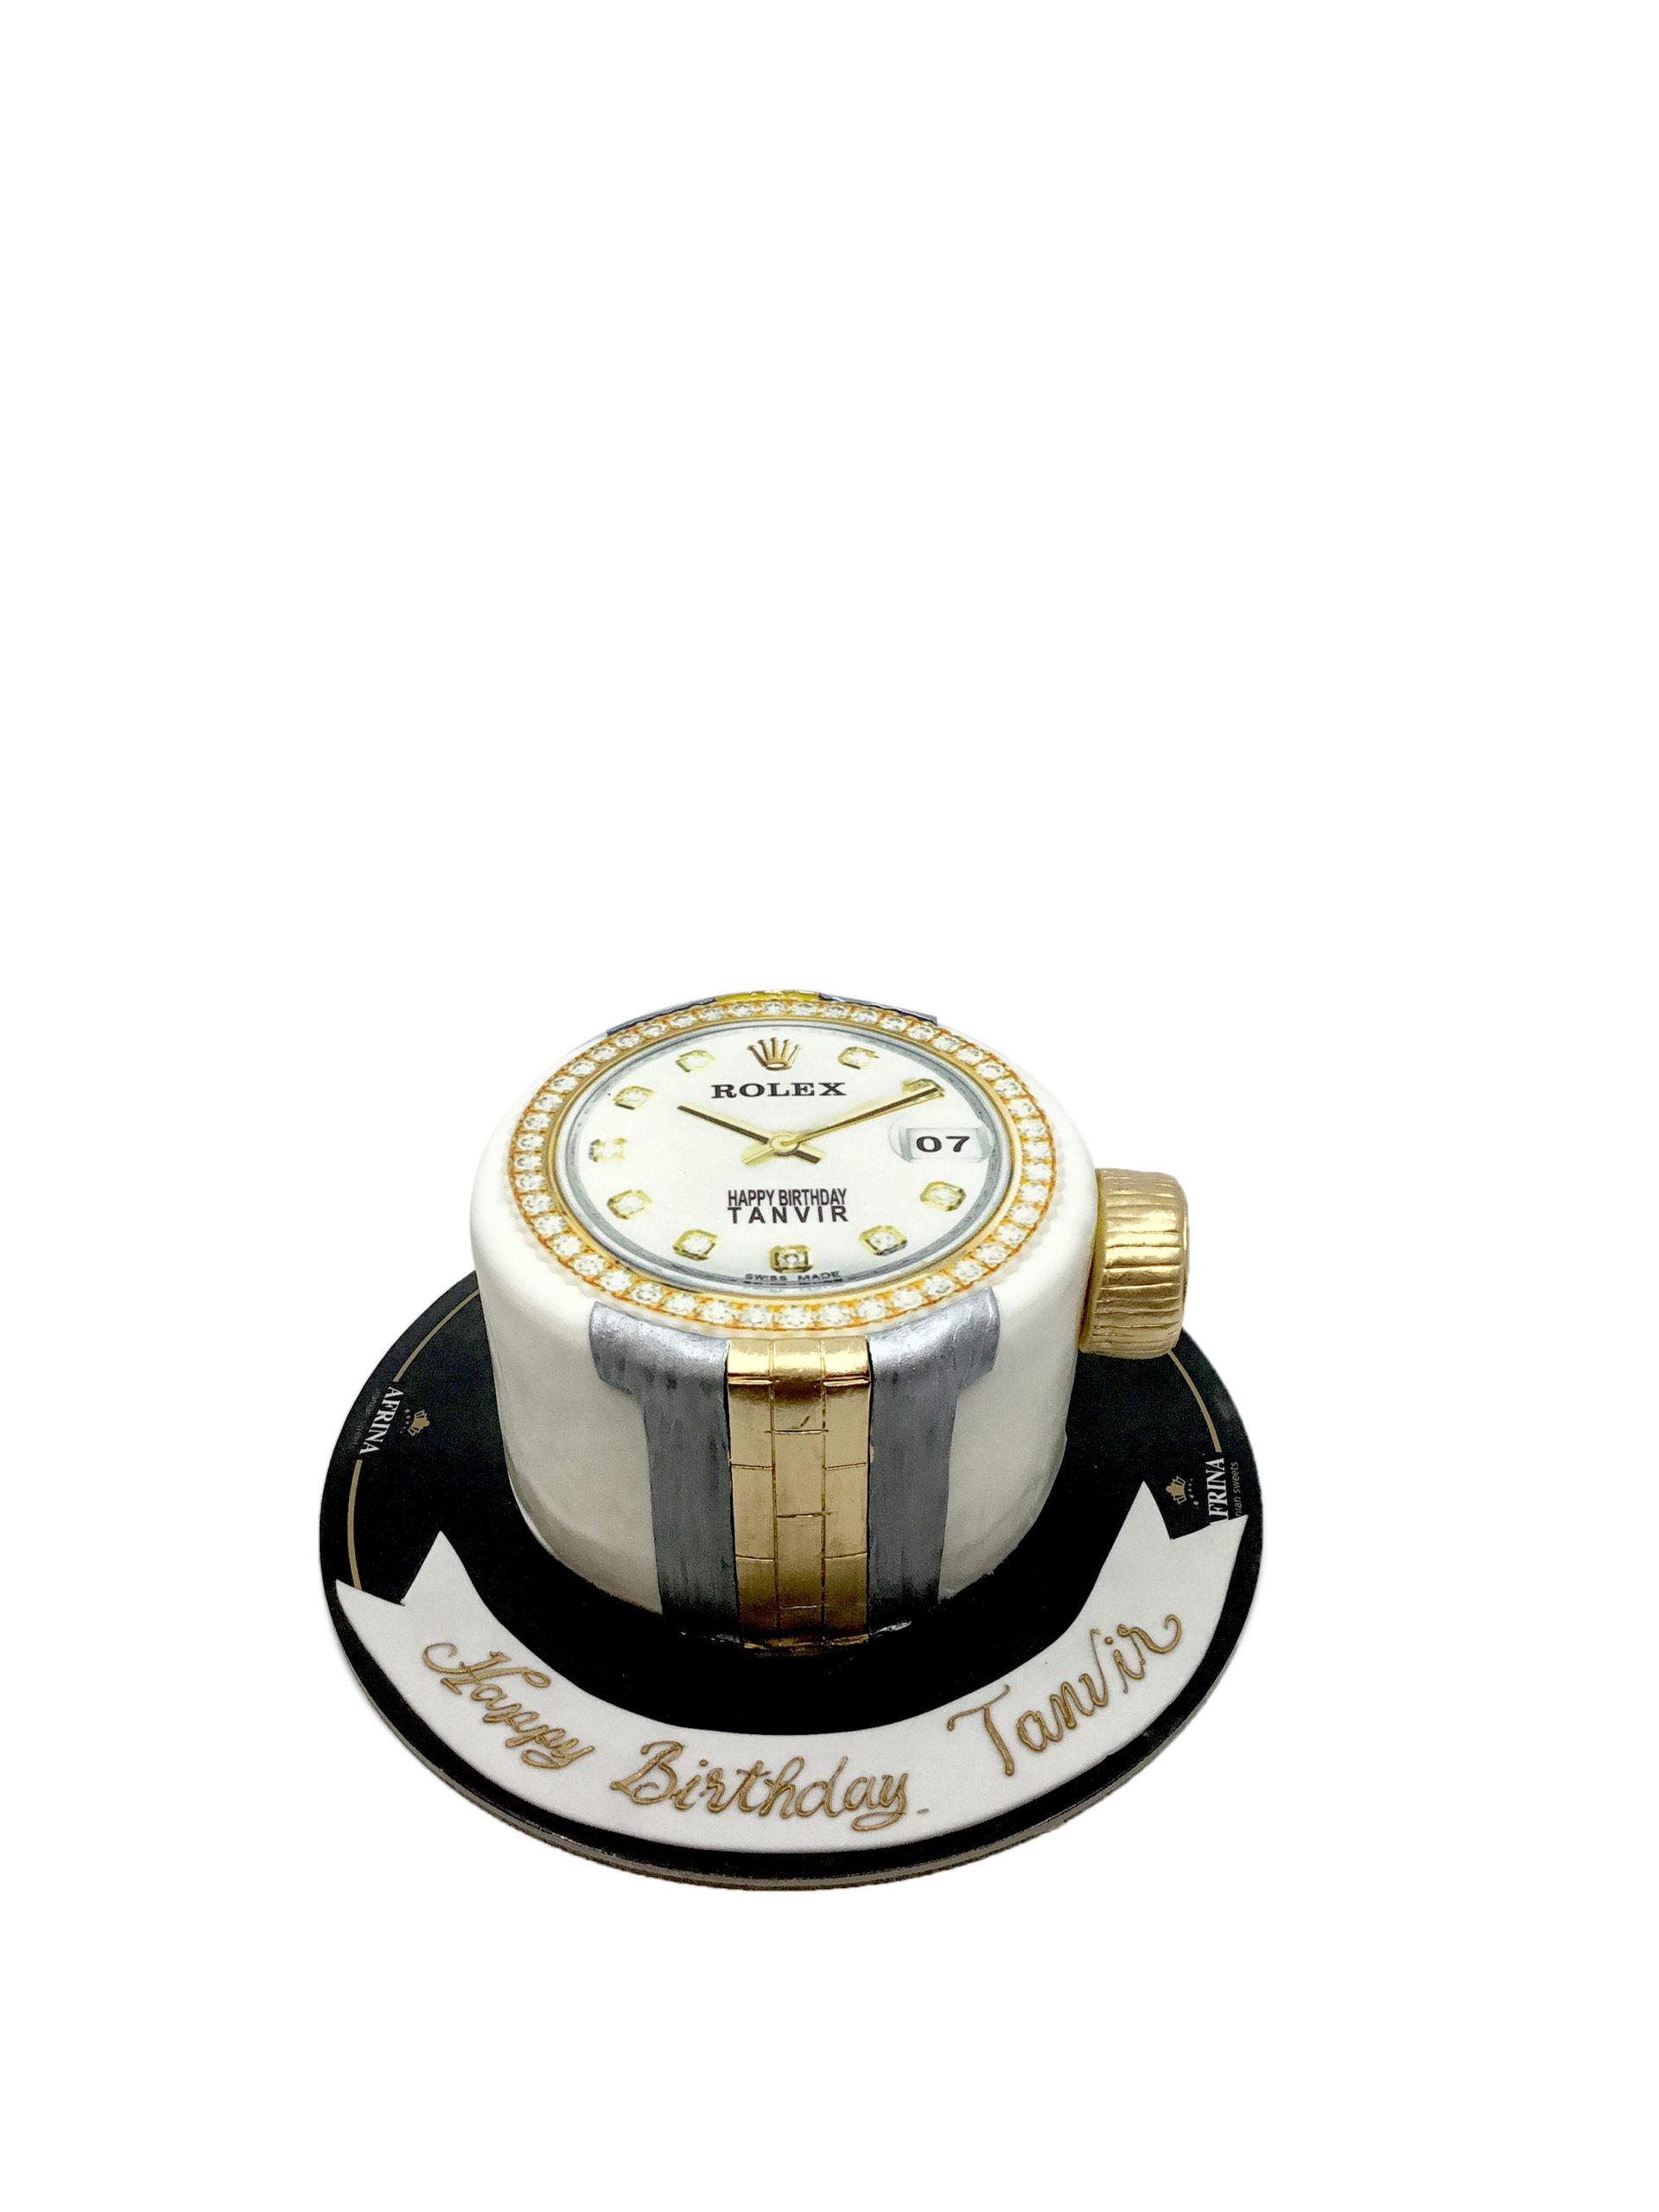 Watch birthdaycake